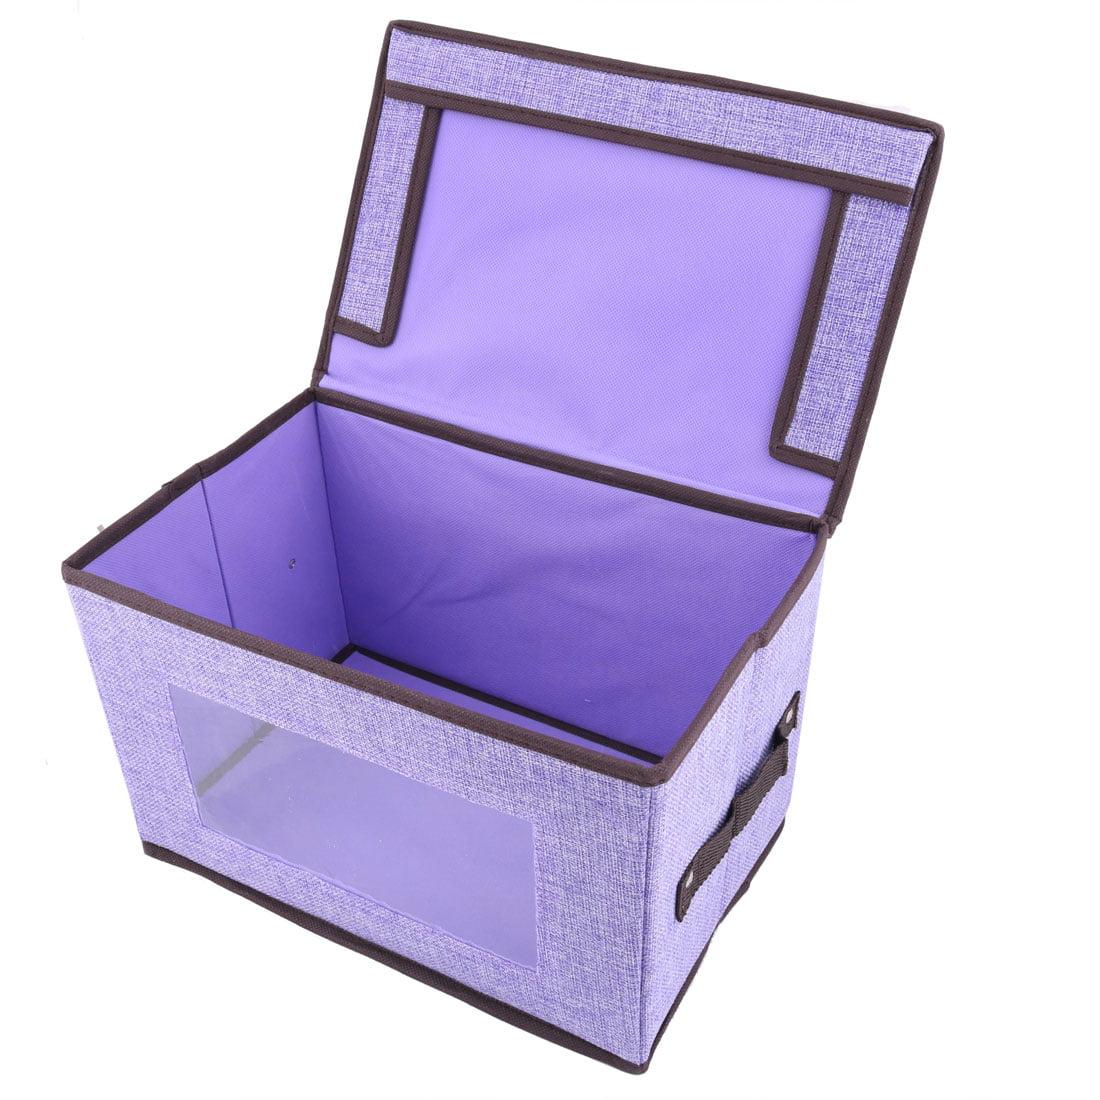 31.5 x 20.5 x 20.5cm Light Purple Linen Foldable Clothes Socks Organizer Box Holder - image 1 of 3